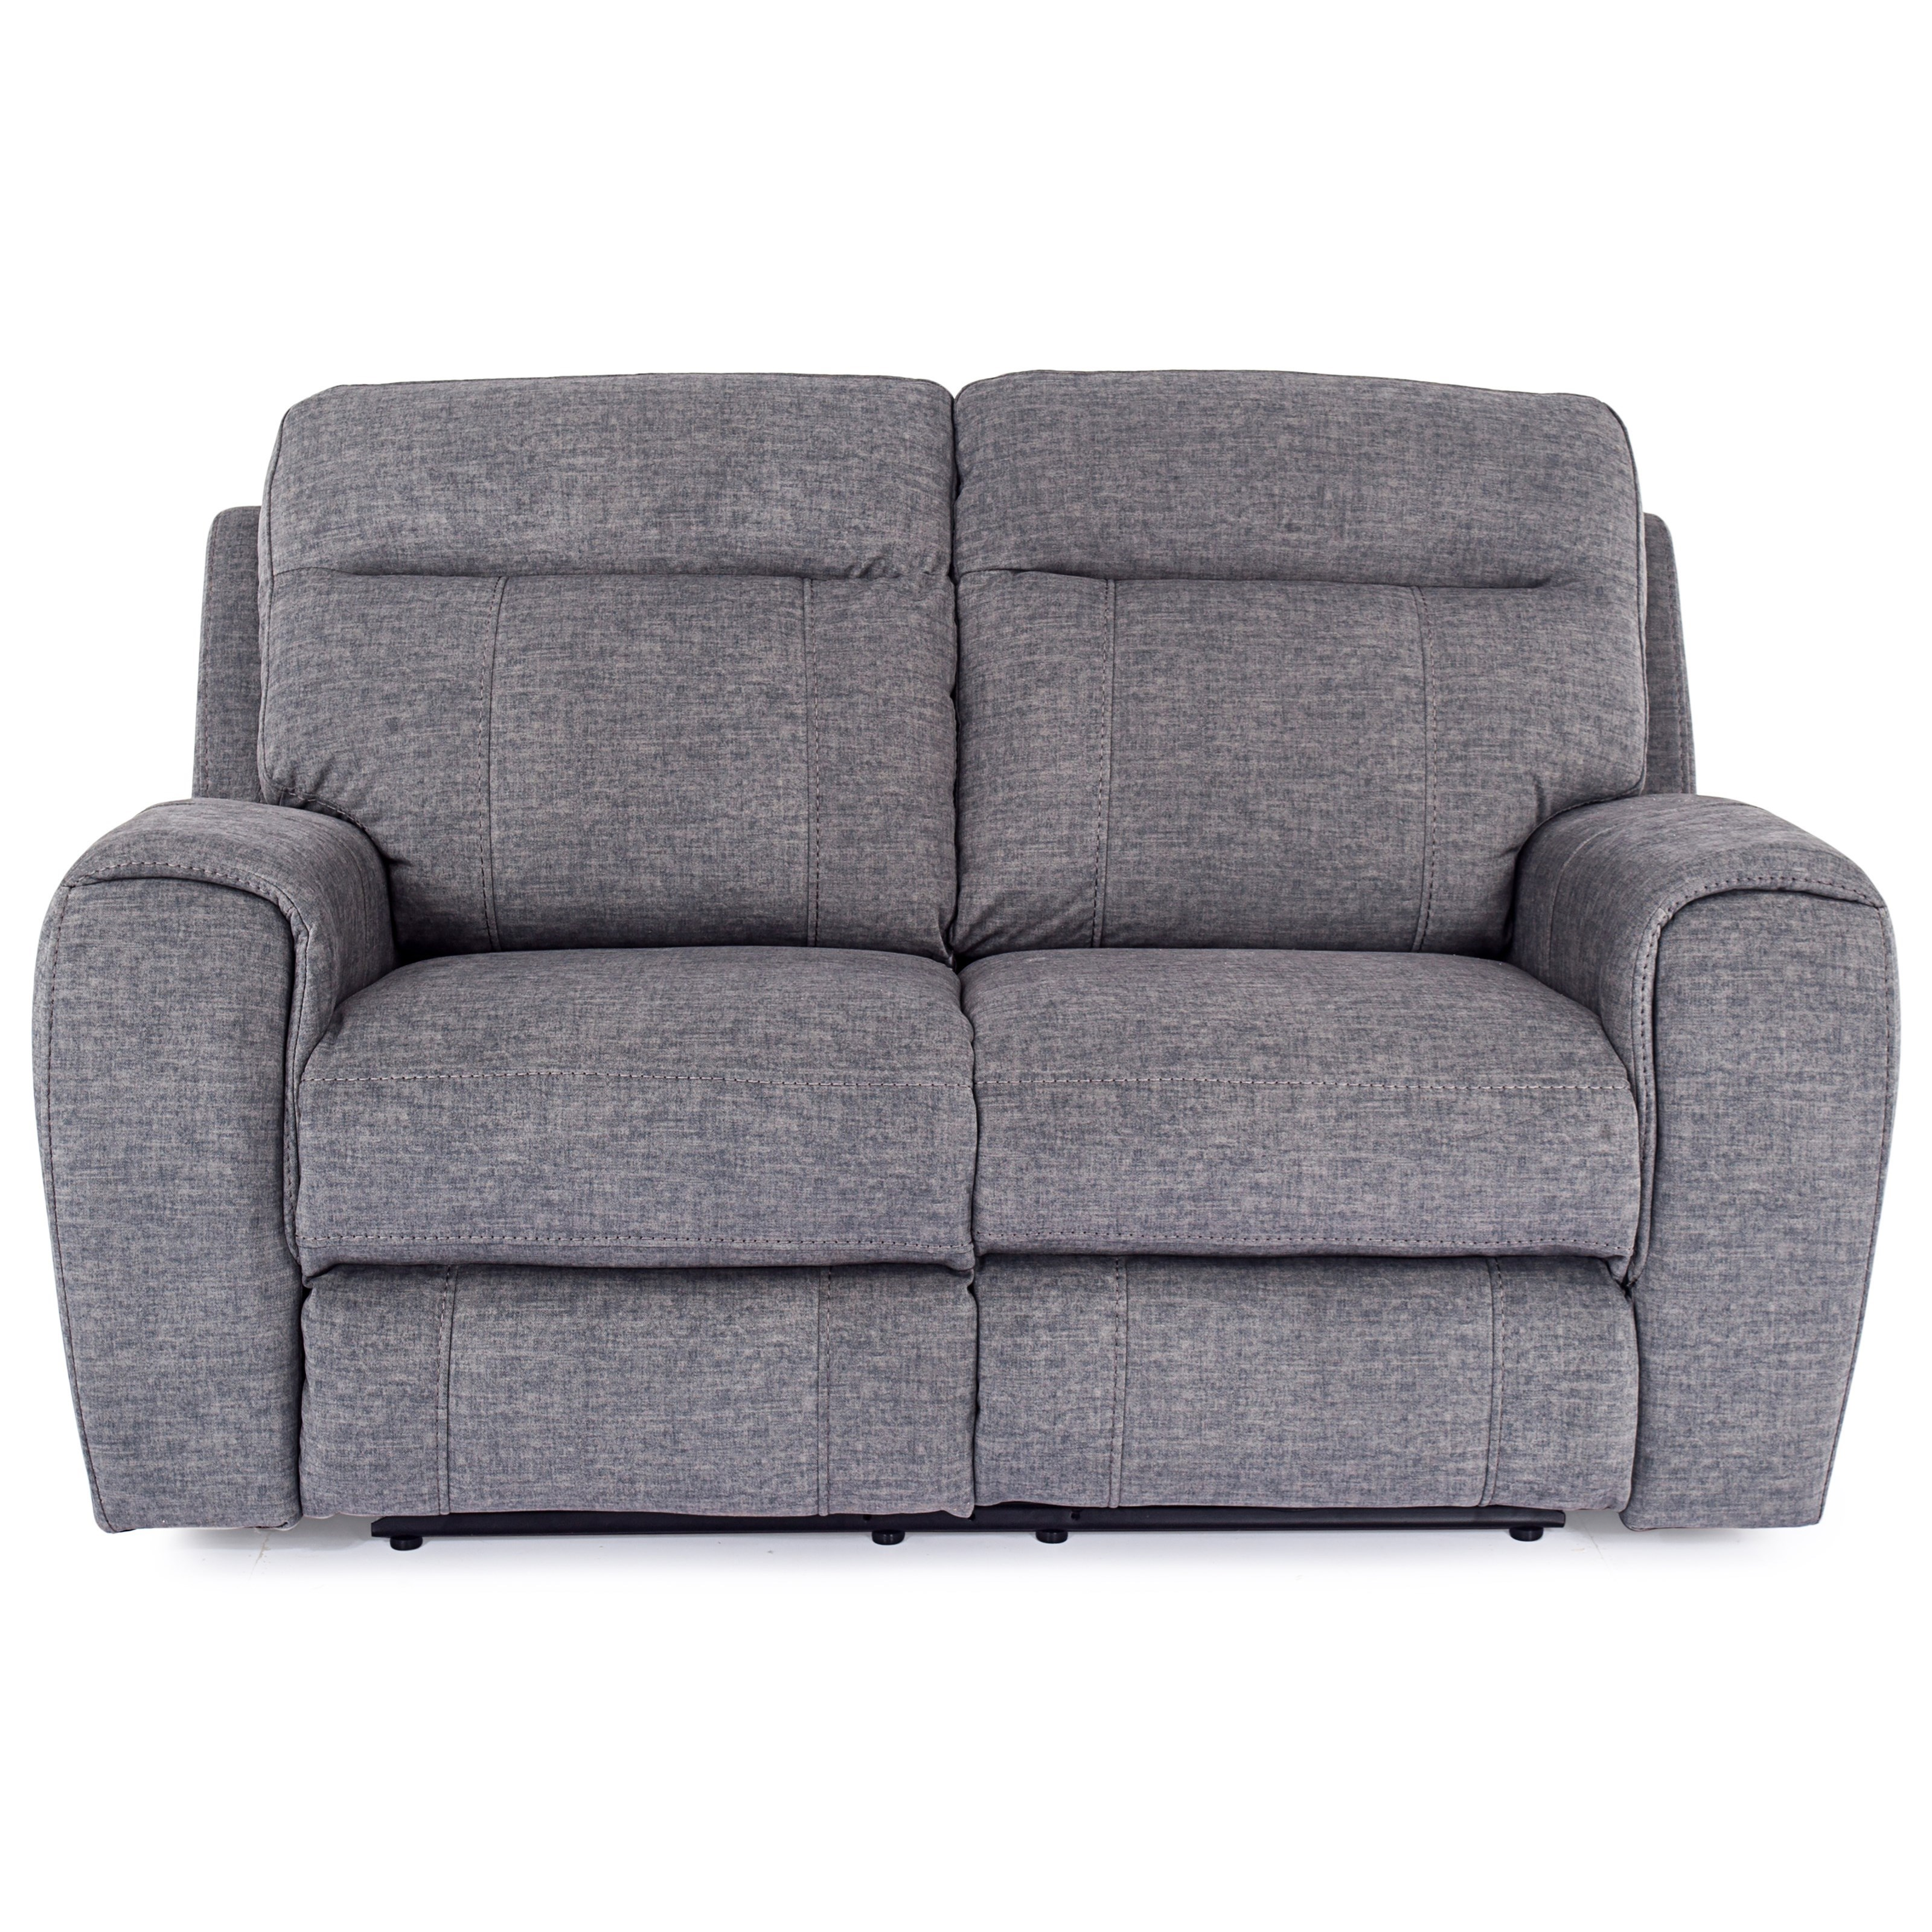 9868 Power Reclining Loveseat w/ Power Headrests at Pilgrim Furniture City